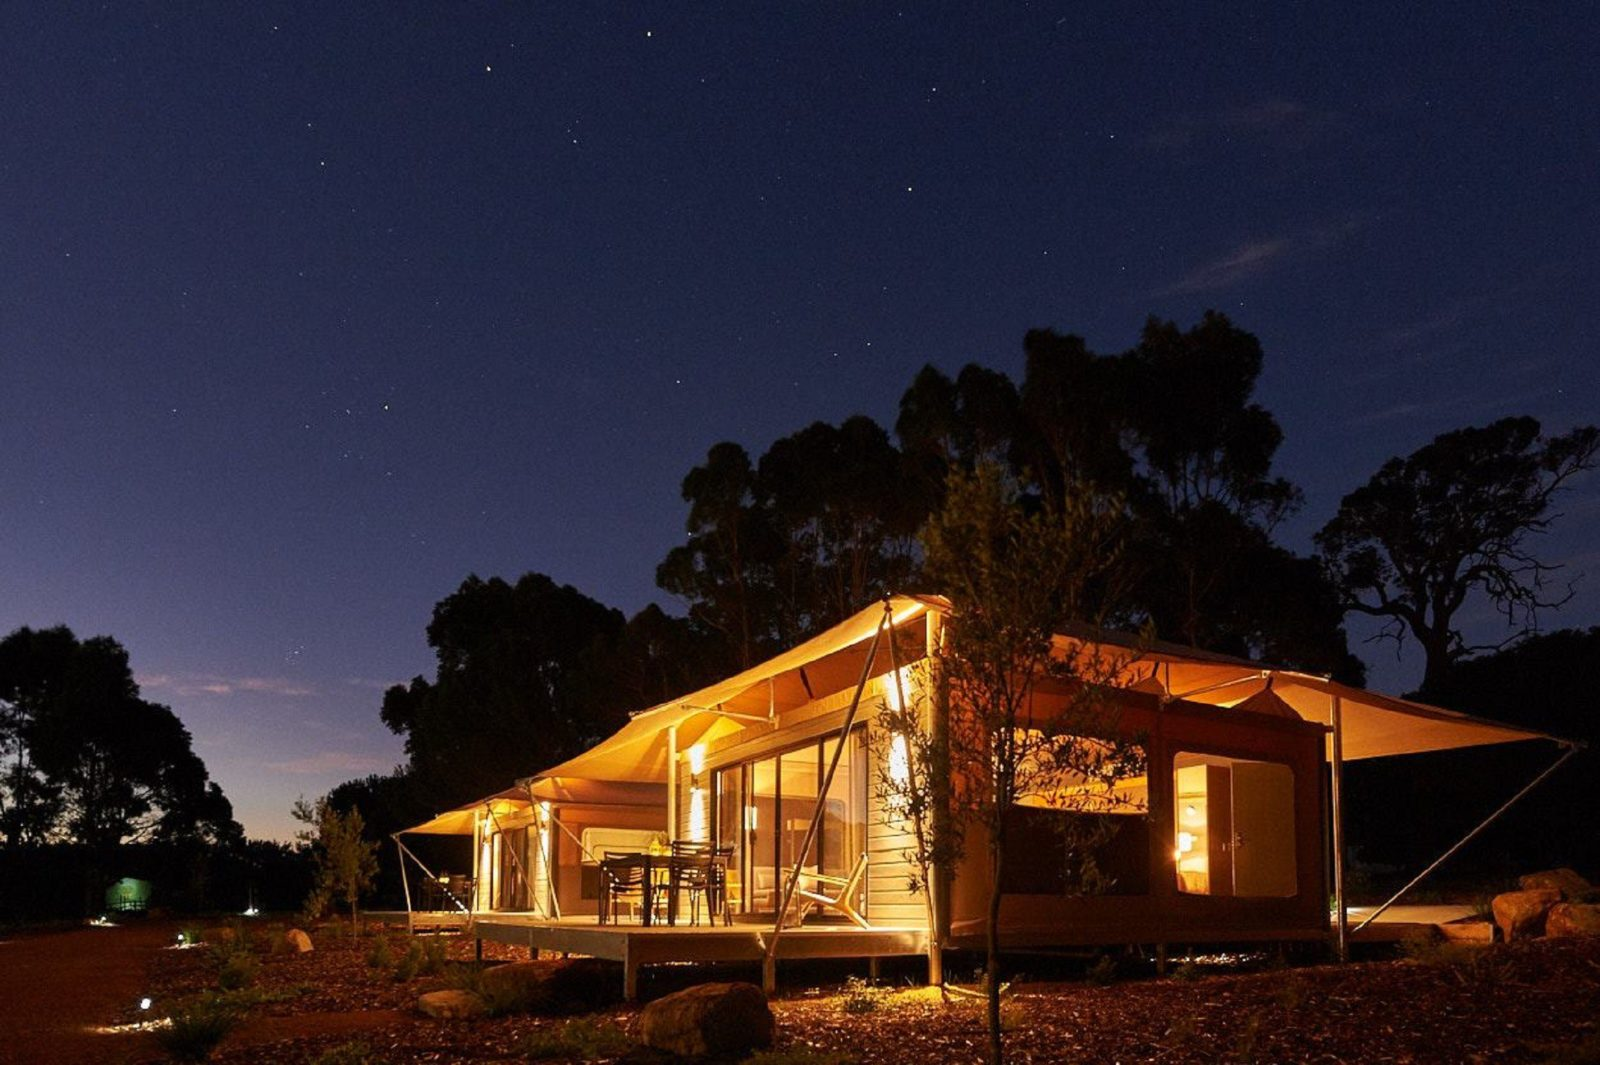 Olio Bello Lakeside Glamping, Cowaramup, Western Australia